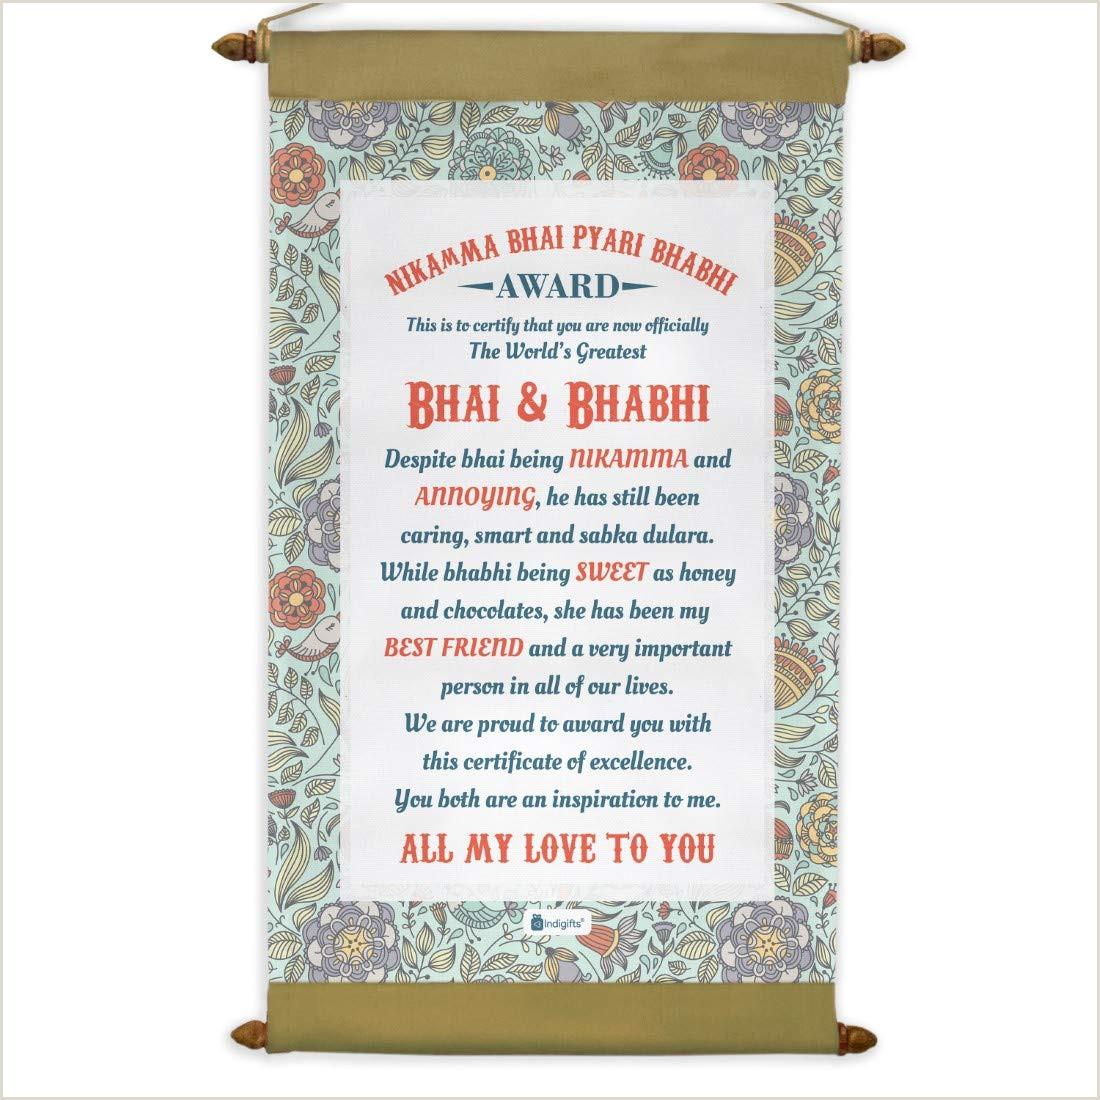 Scrolling Banner Stand Indi Ts Rakhi Gift For Brother And Bhabhi Nikkama Bhai Pyari Bhabhi Printed Scroll Message Card 9 5 X 17 Inches Rakshabandhan Gift For Sister In